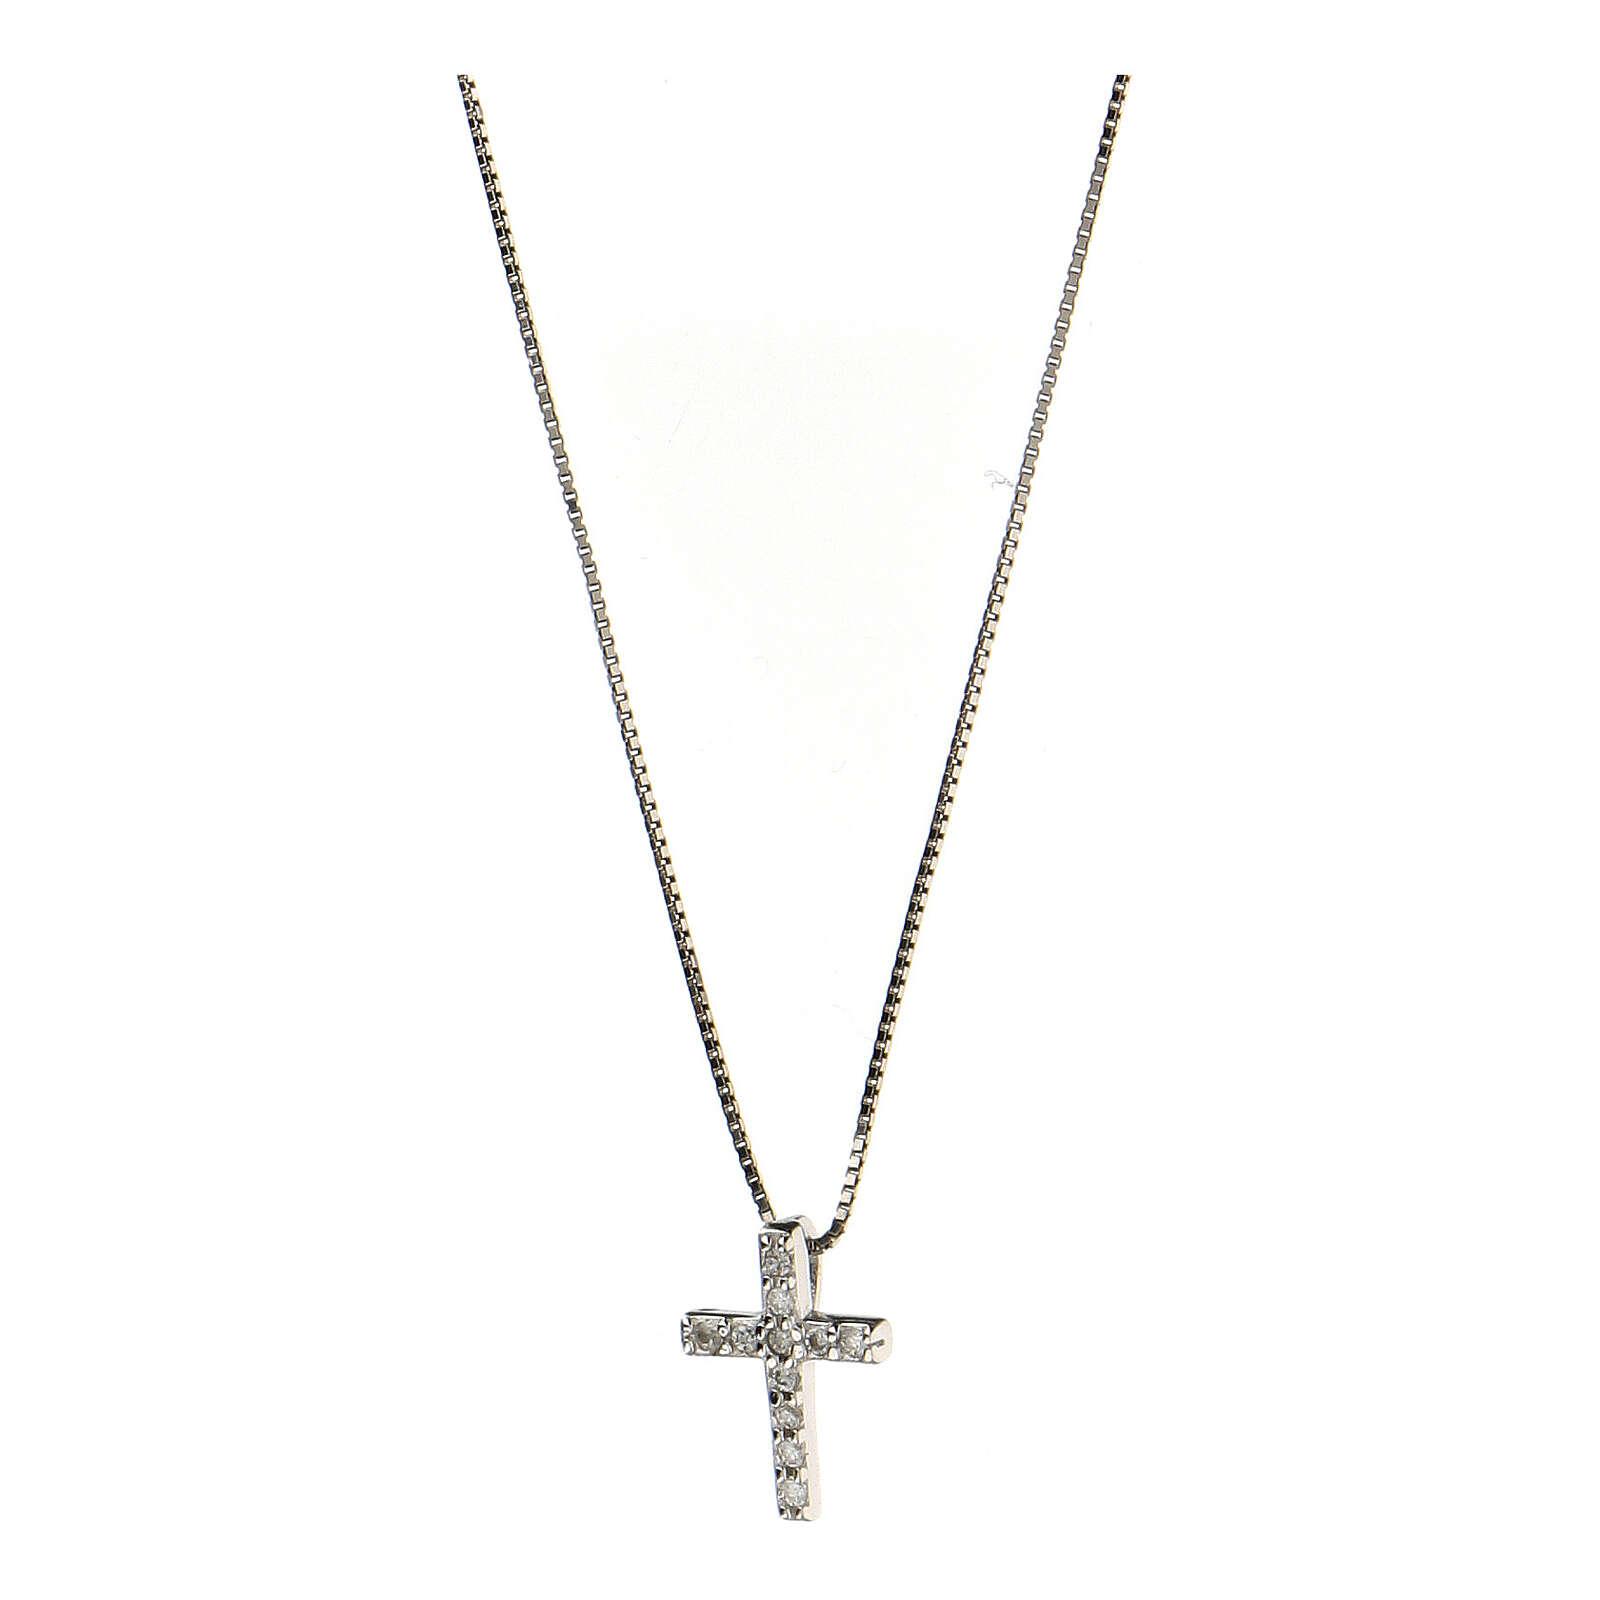 Collana croce argento 925 fila zirconi 4